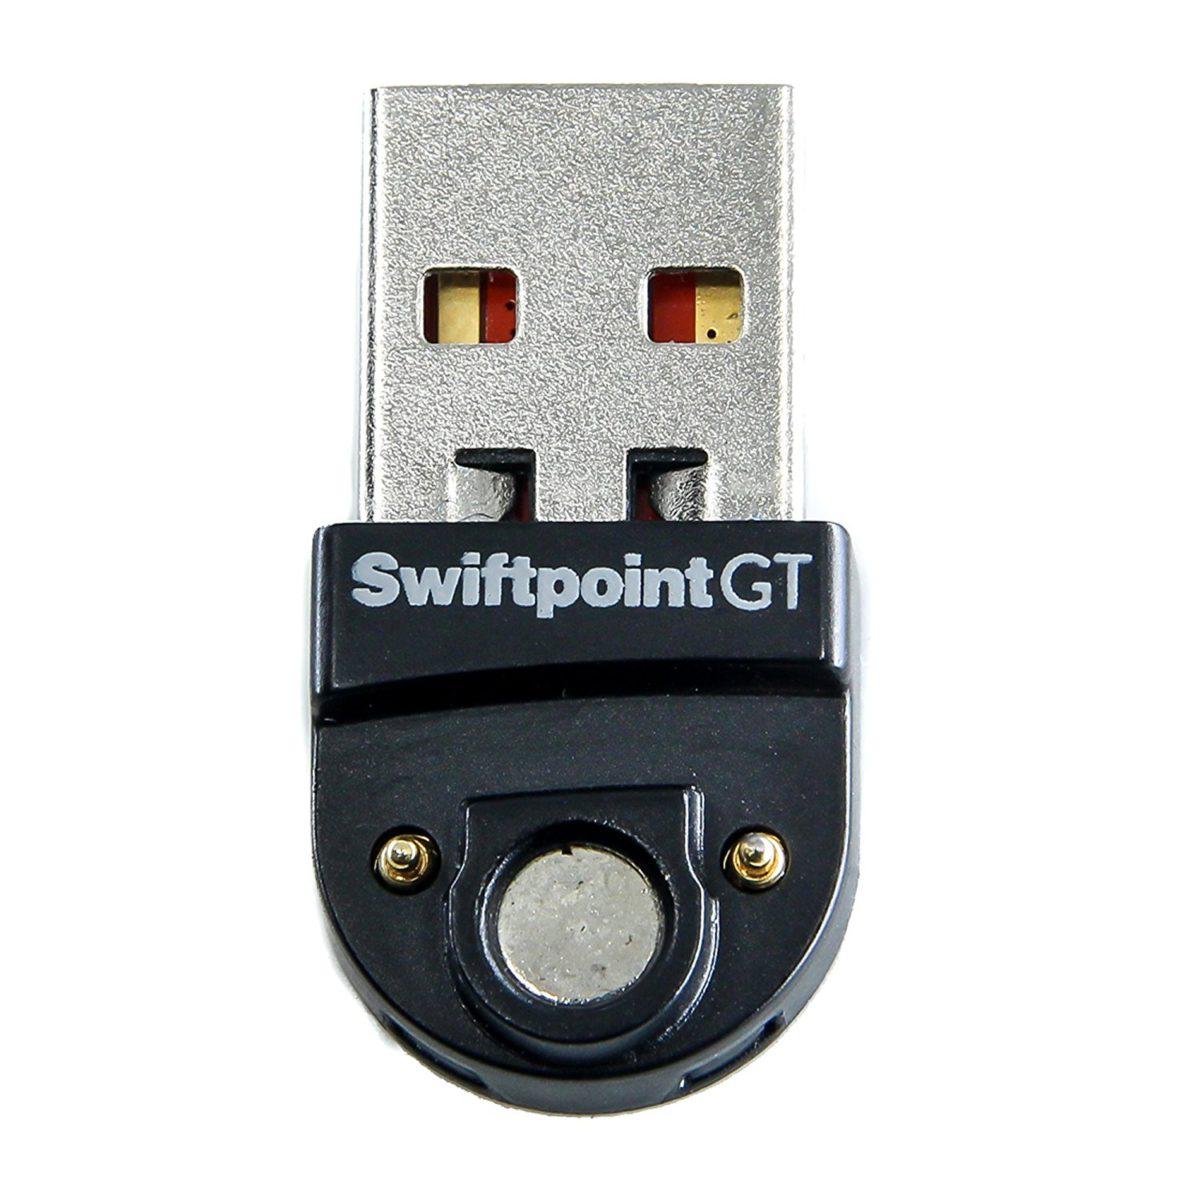 USB-приемник и зарядное устройство для мыши Swiftpoint GT